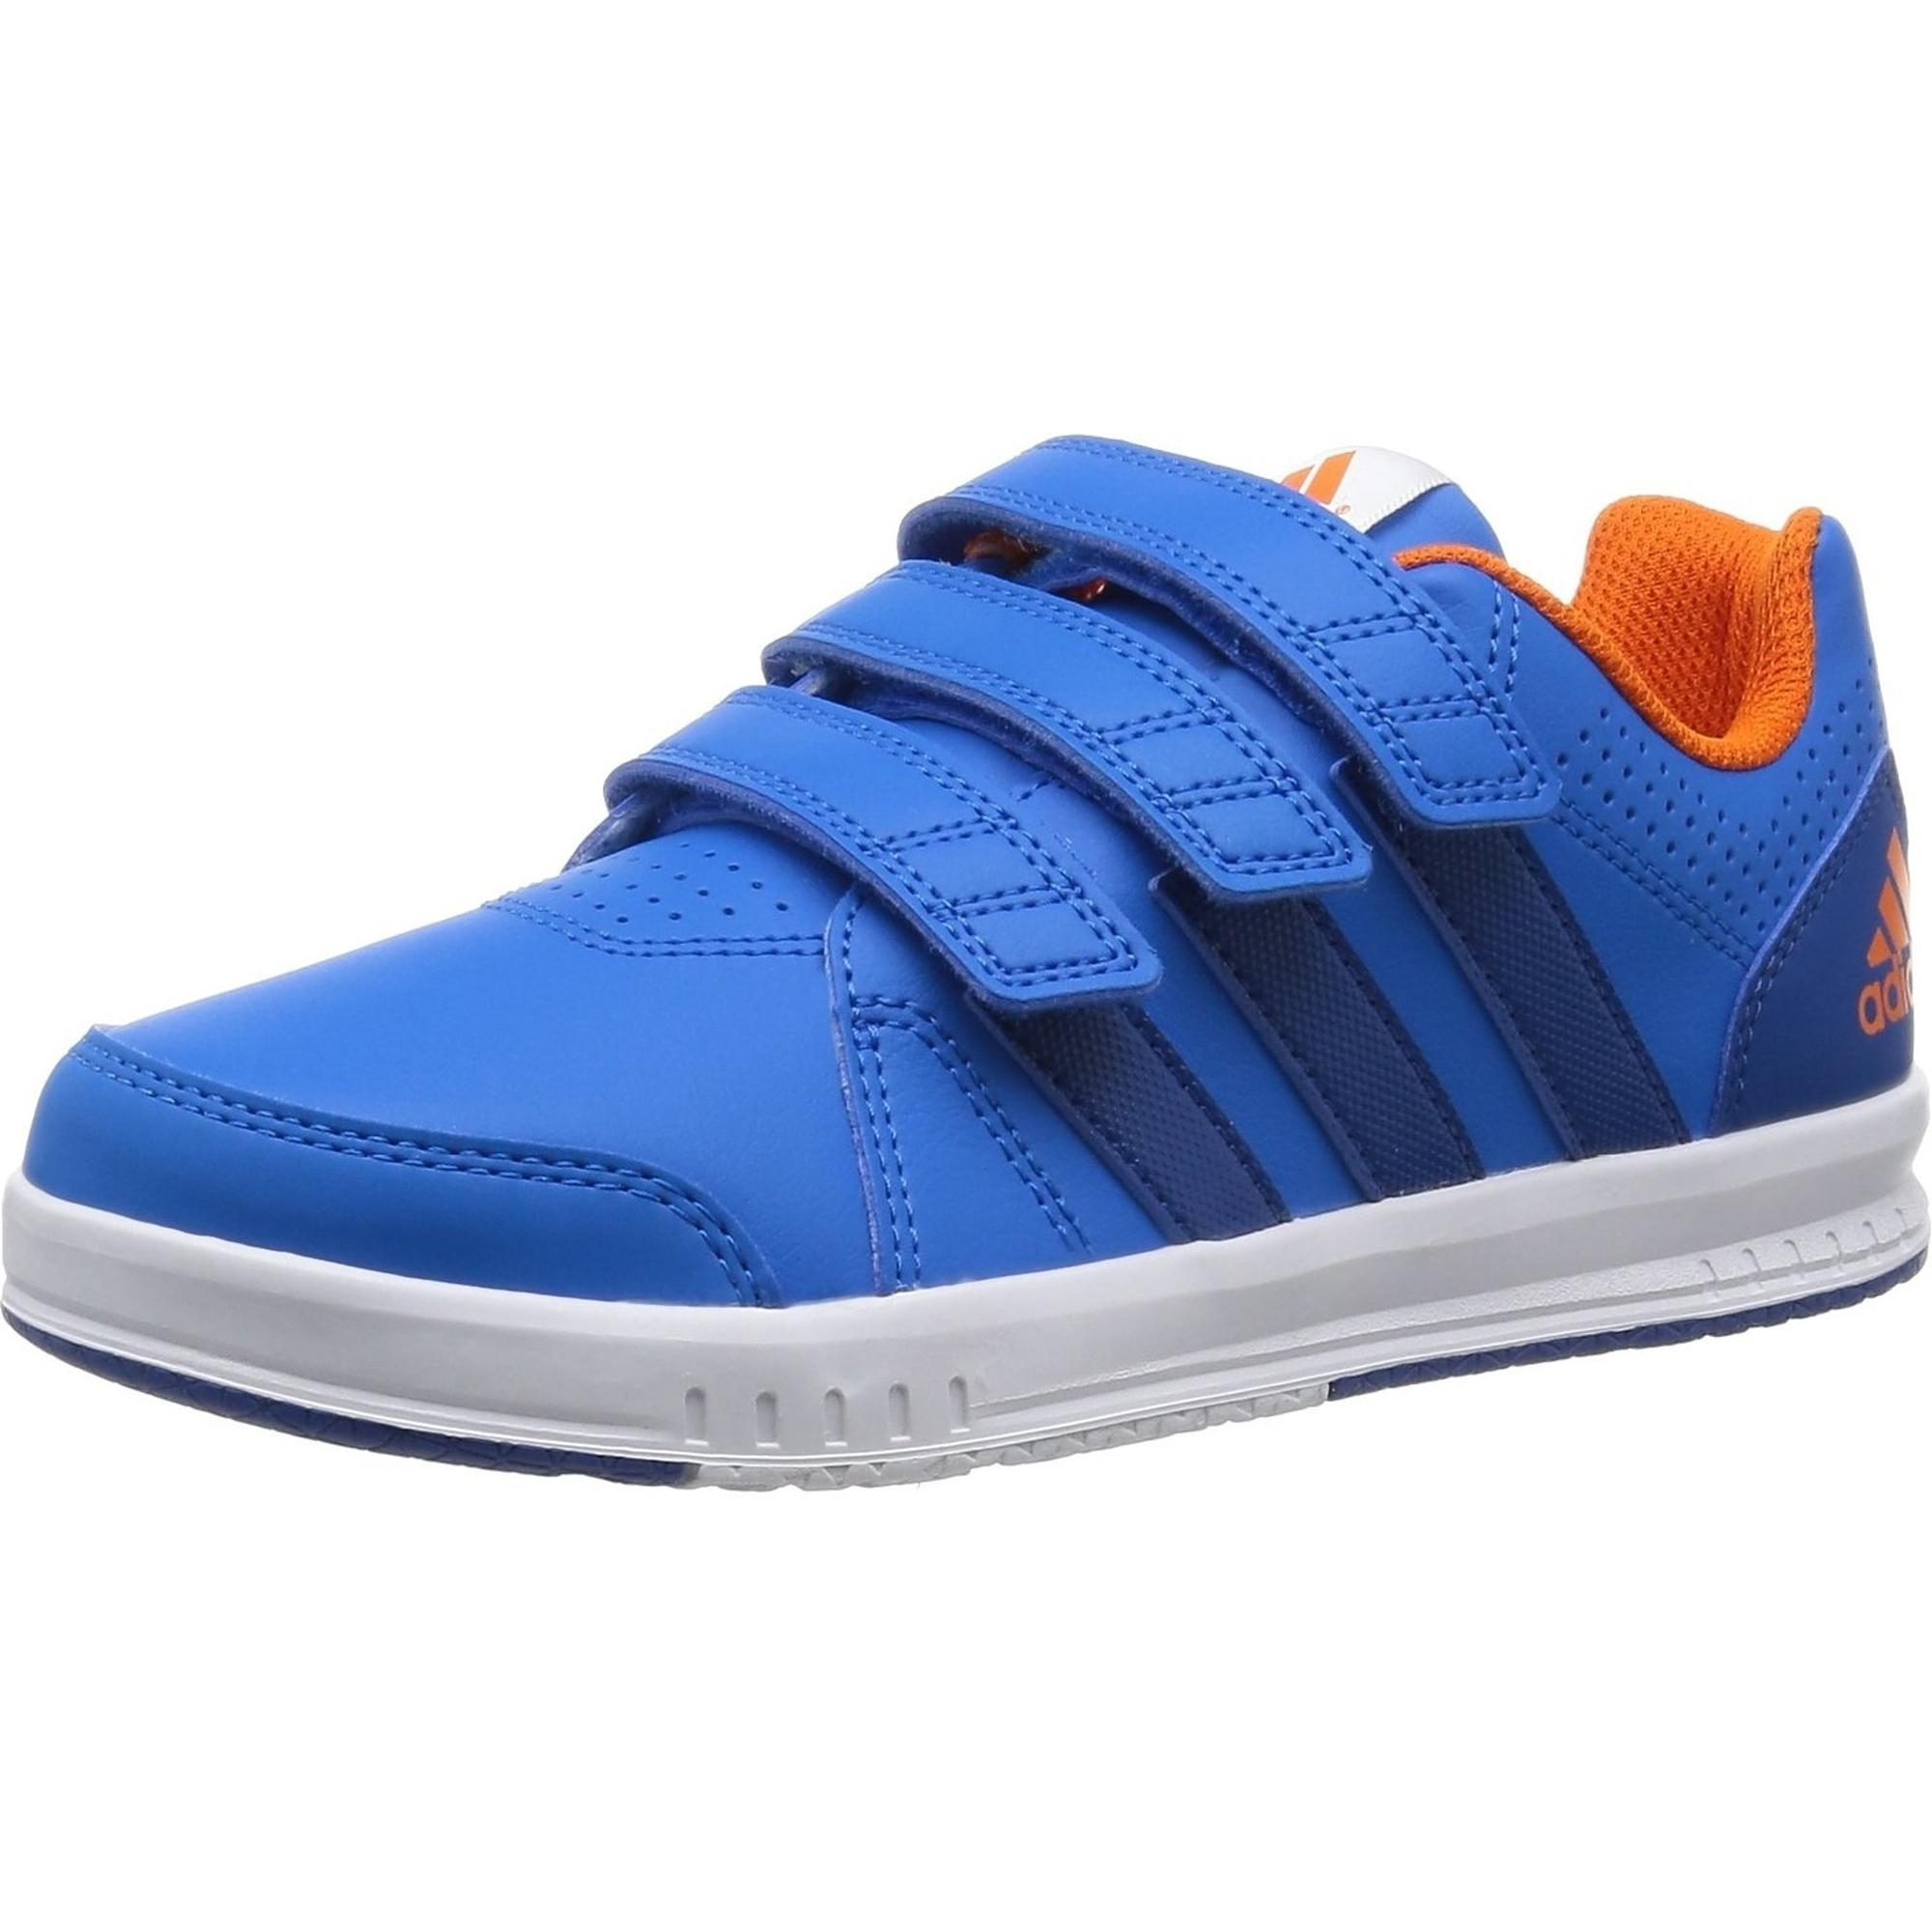 Großhandel Aq4817 35 Trainer Cf K Kinder Schuhe Adidas